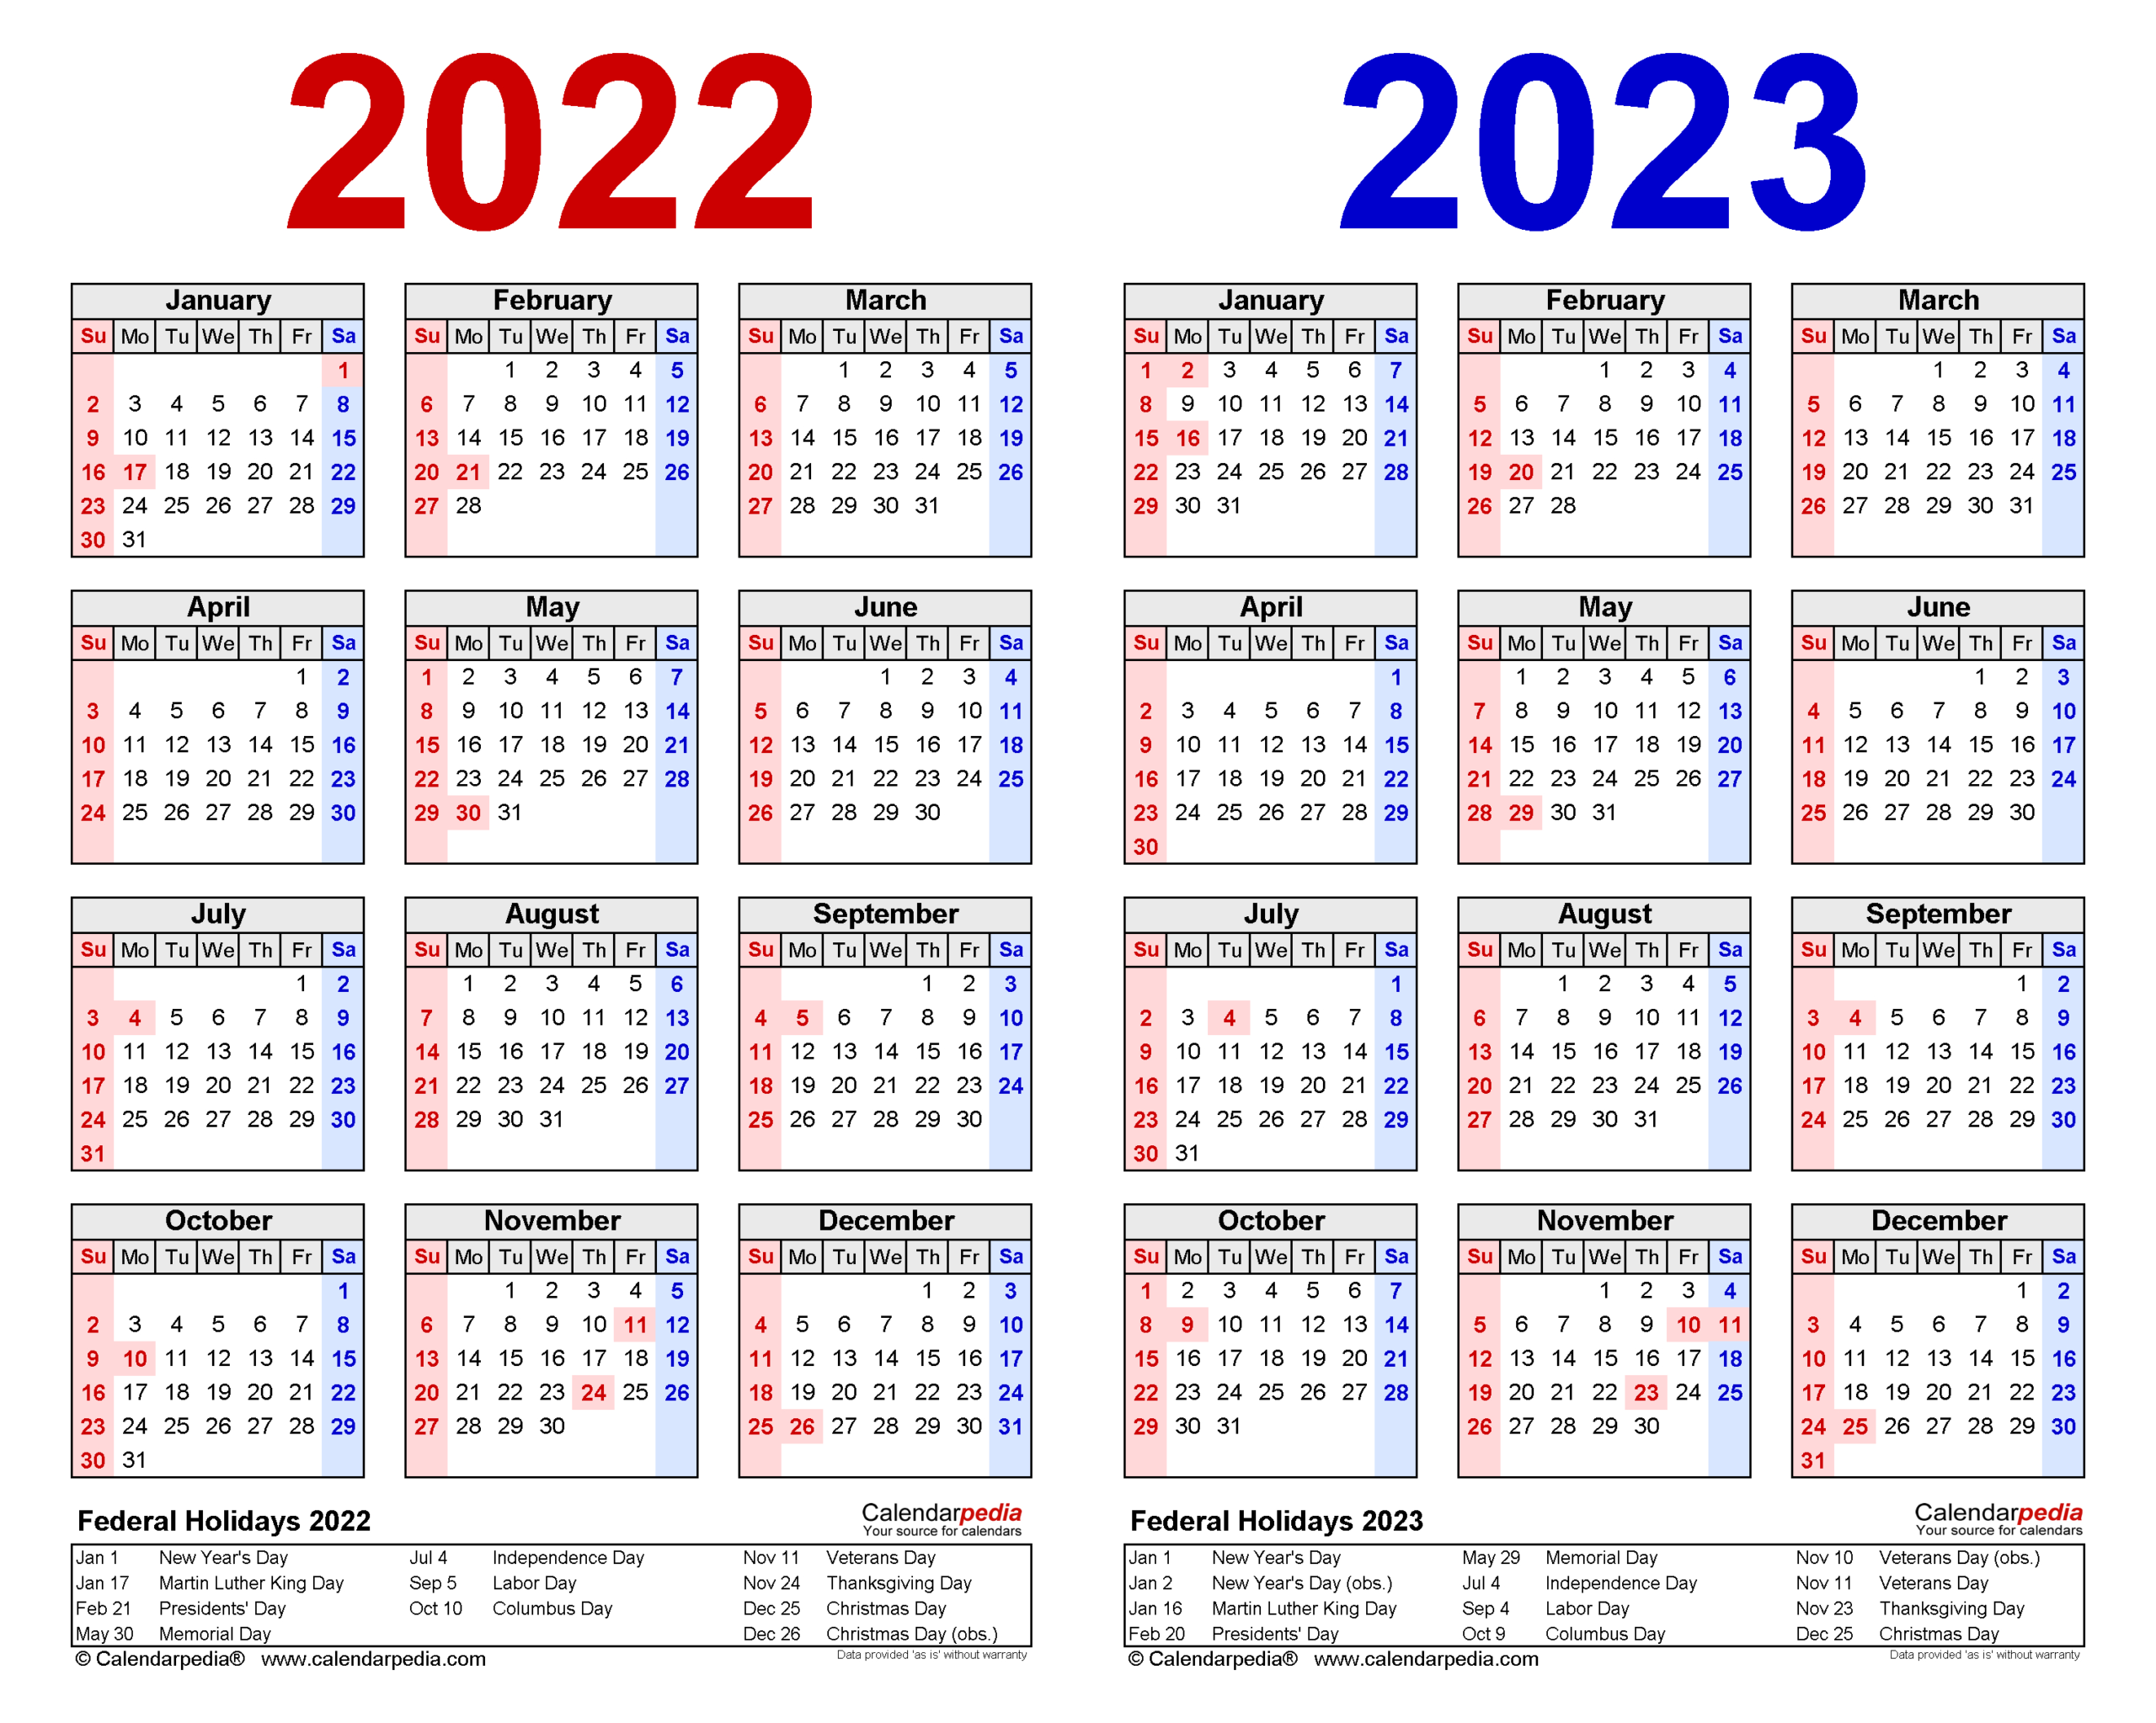 Year 2022 Calendar In Excel